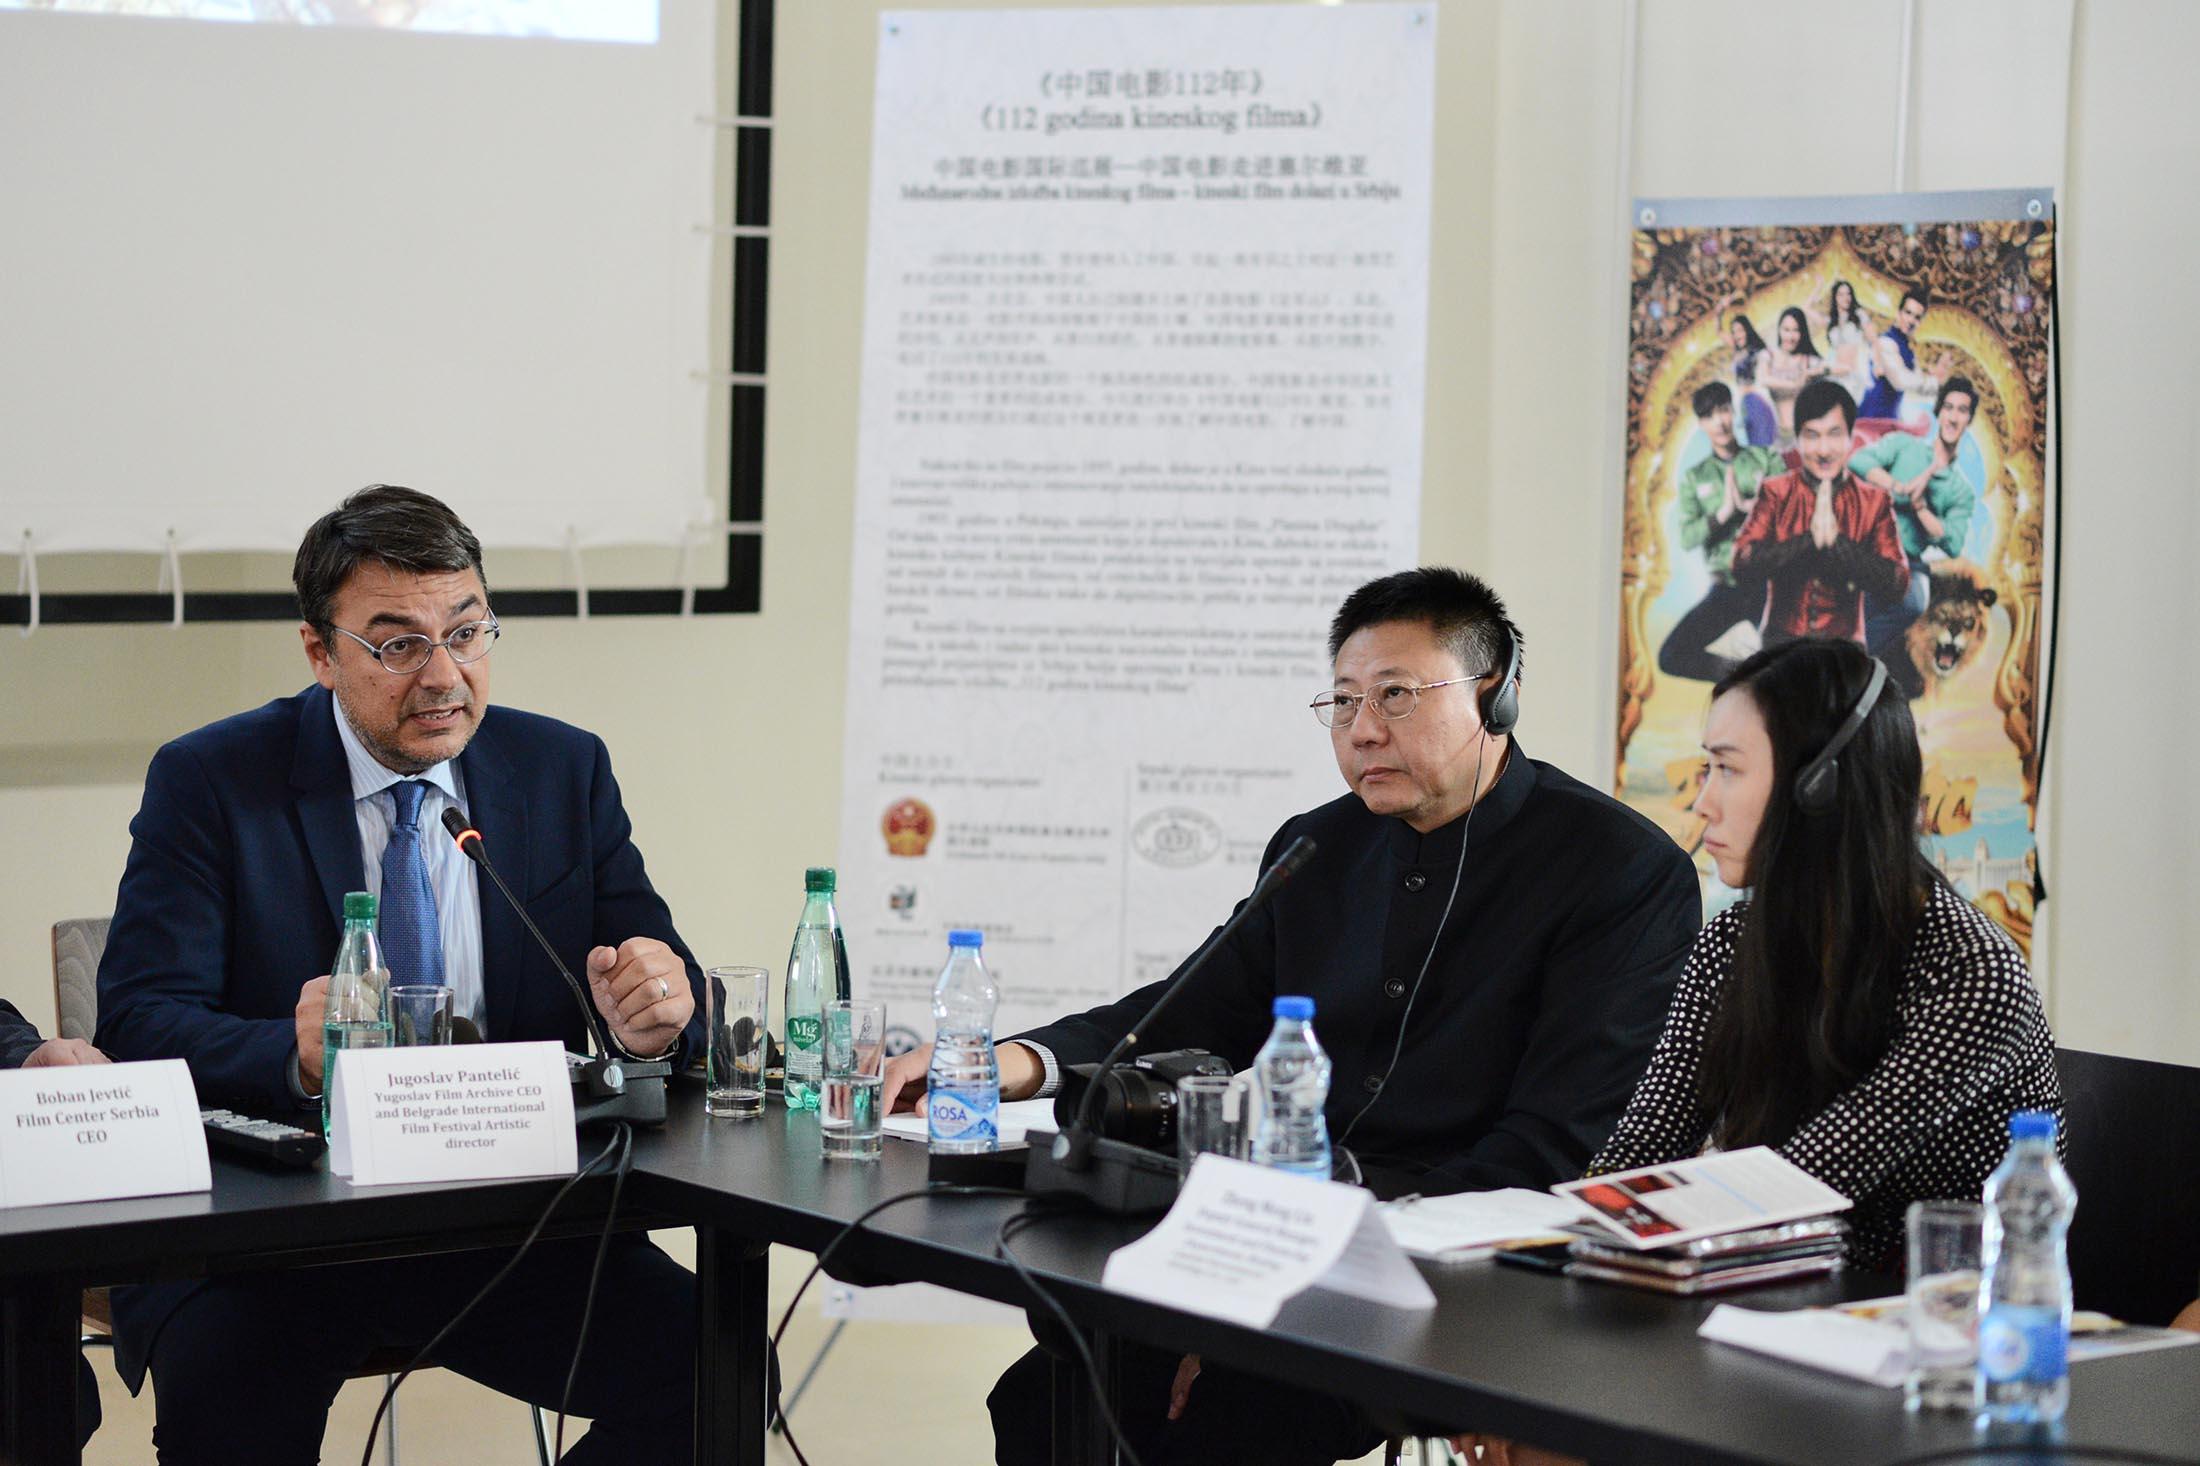 Memorandum Kina-Kinoteka 3